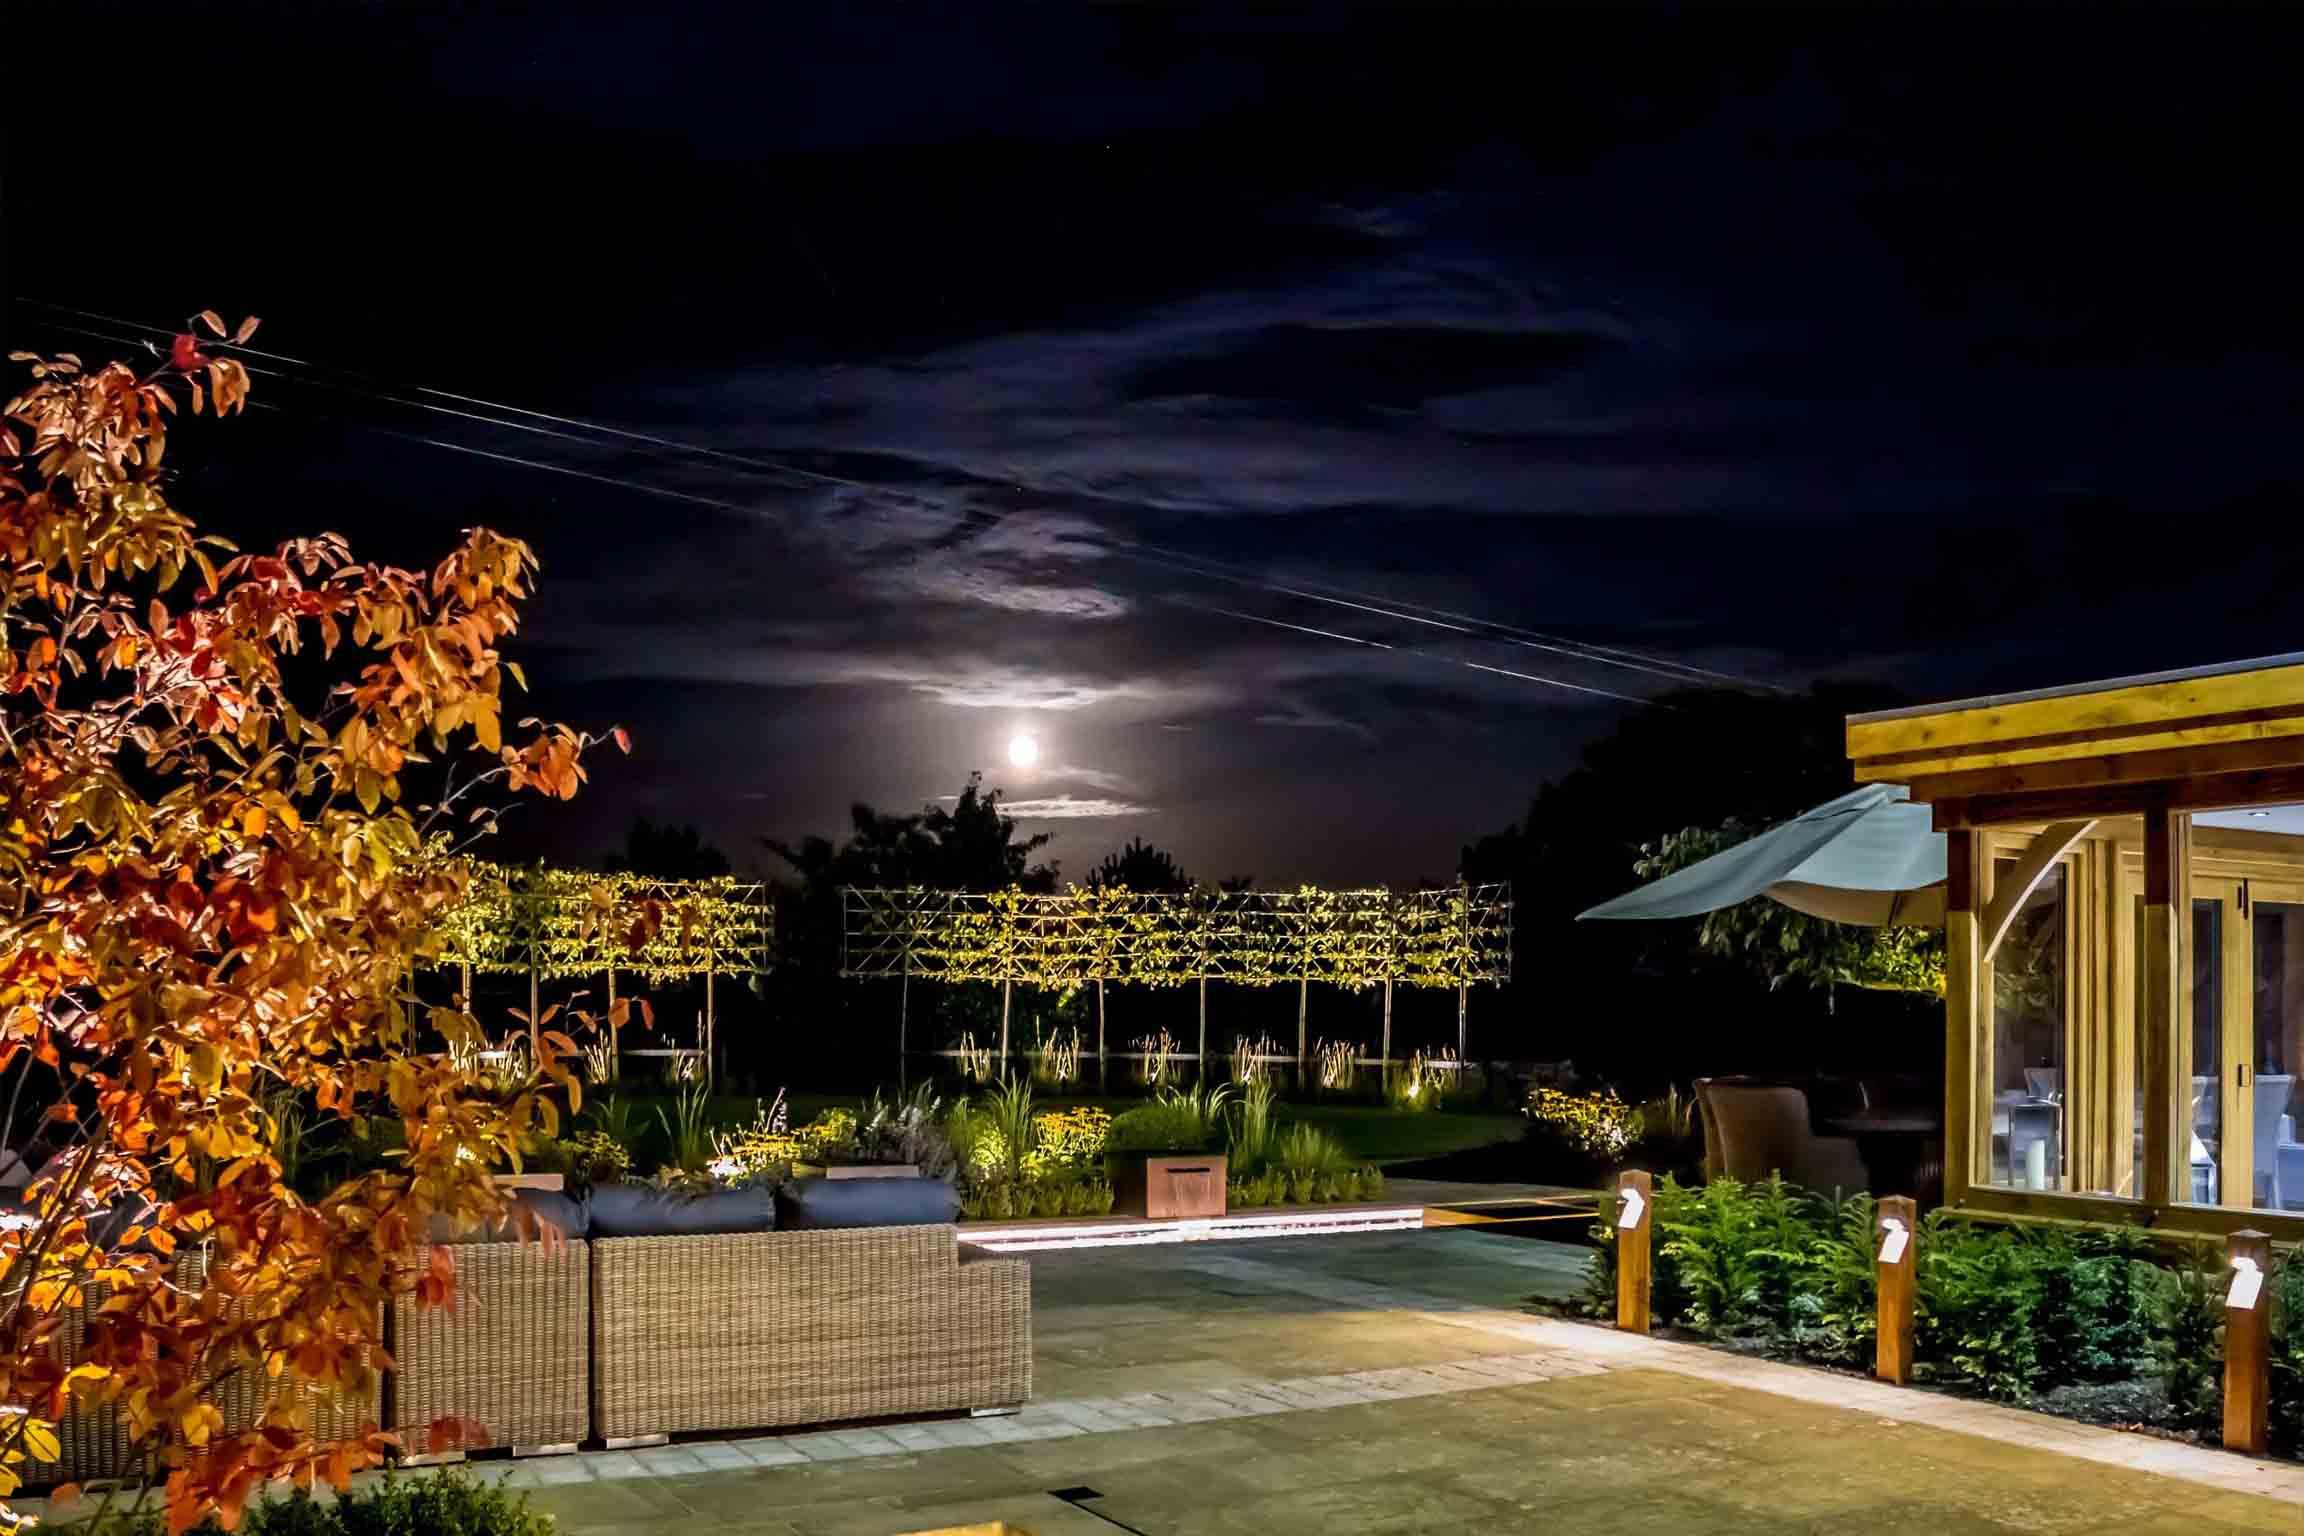 Automated garden lighting